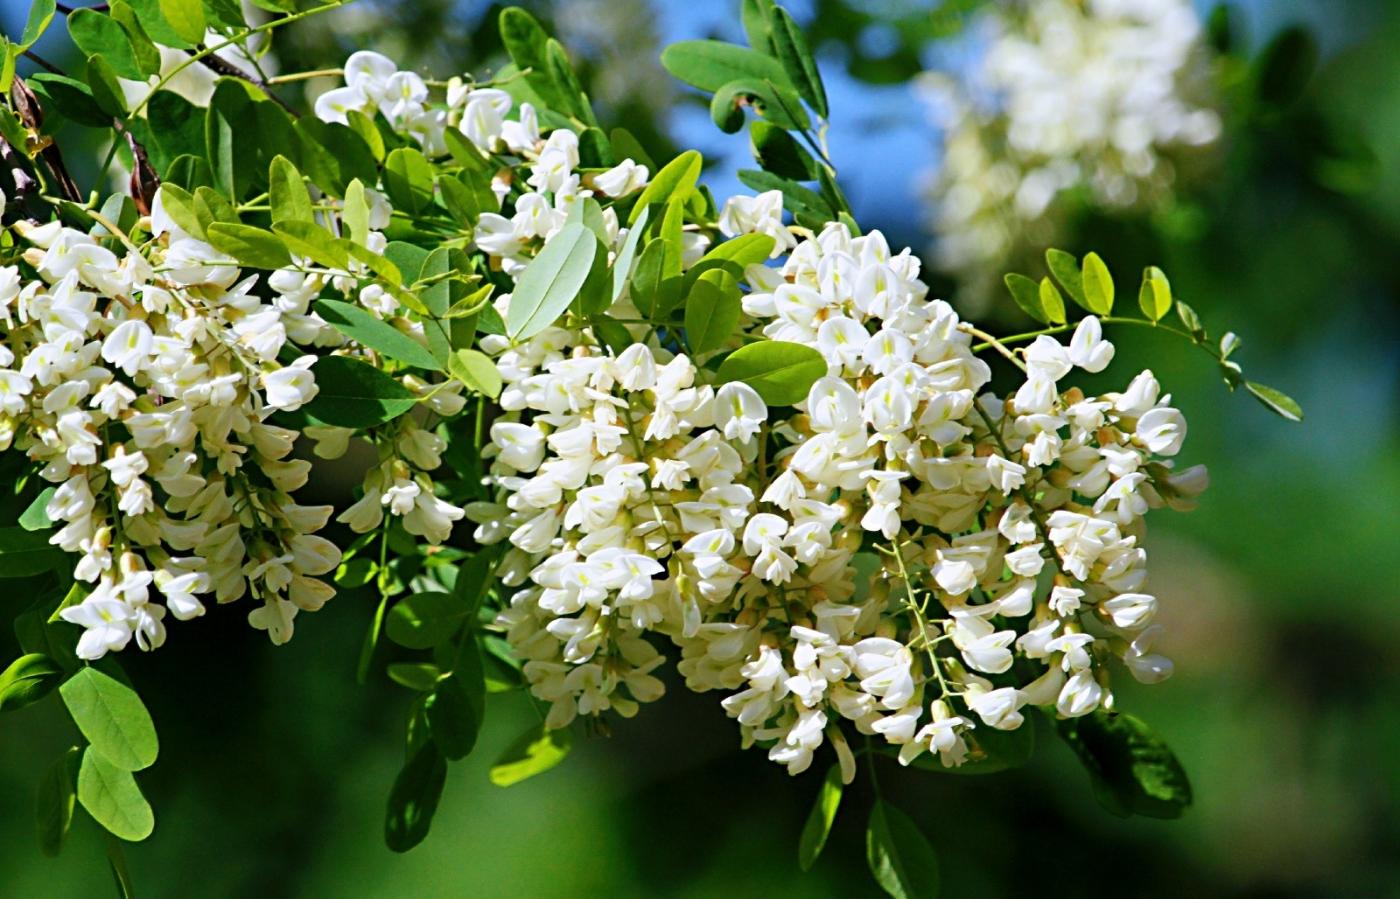 【田螺随拍】美国黄杨american yellowwood_图1-12